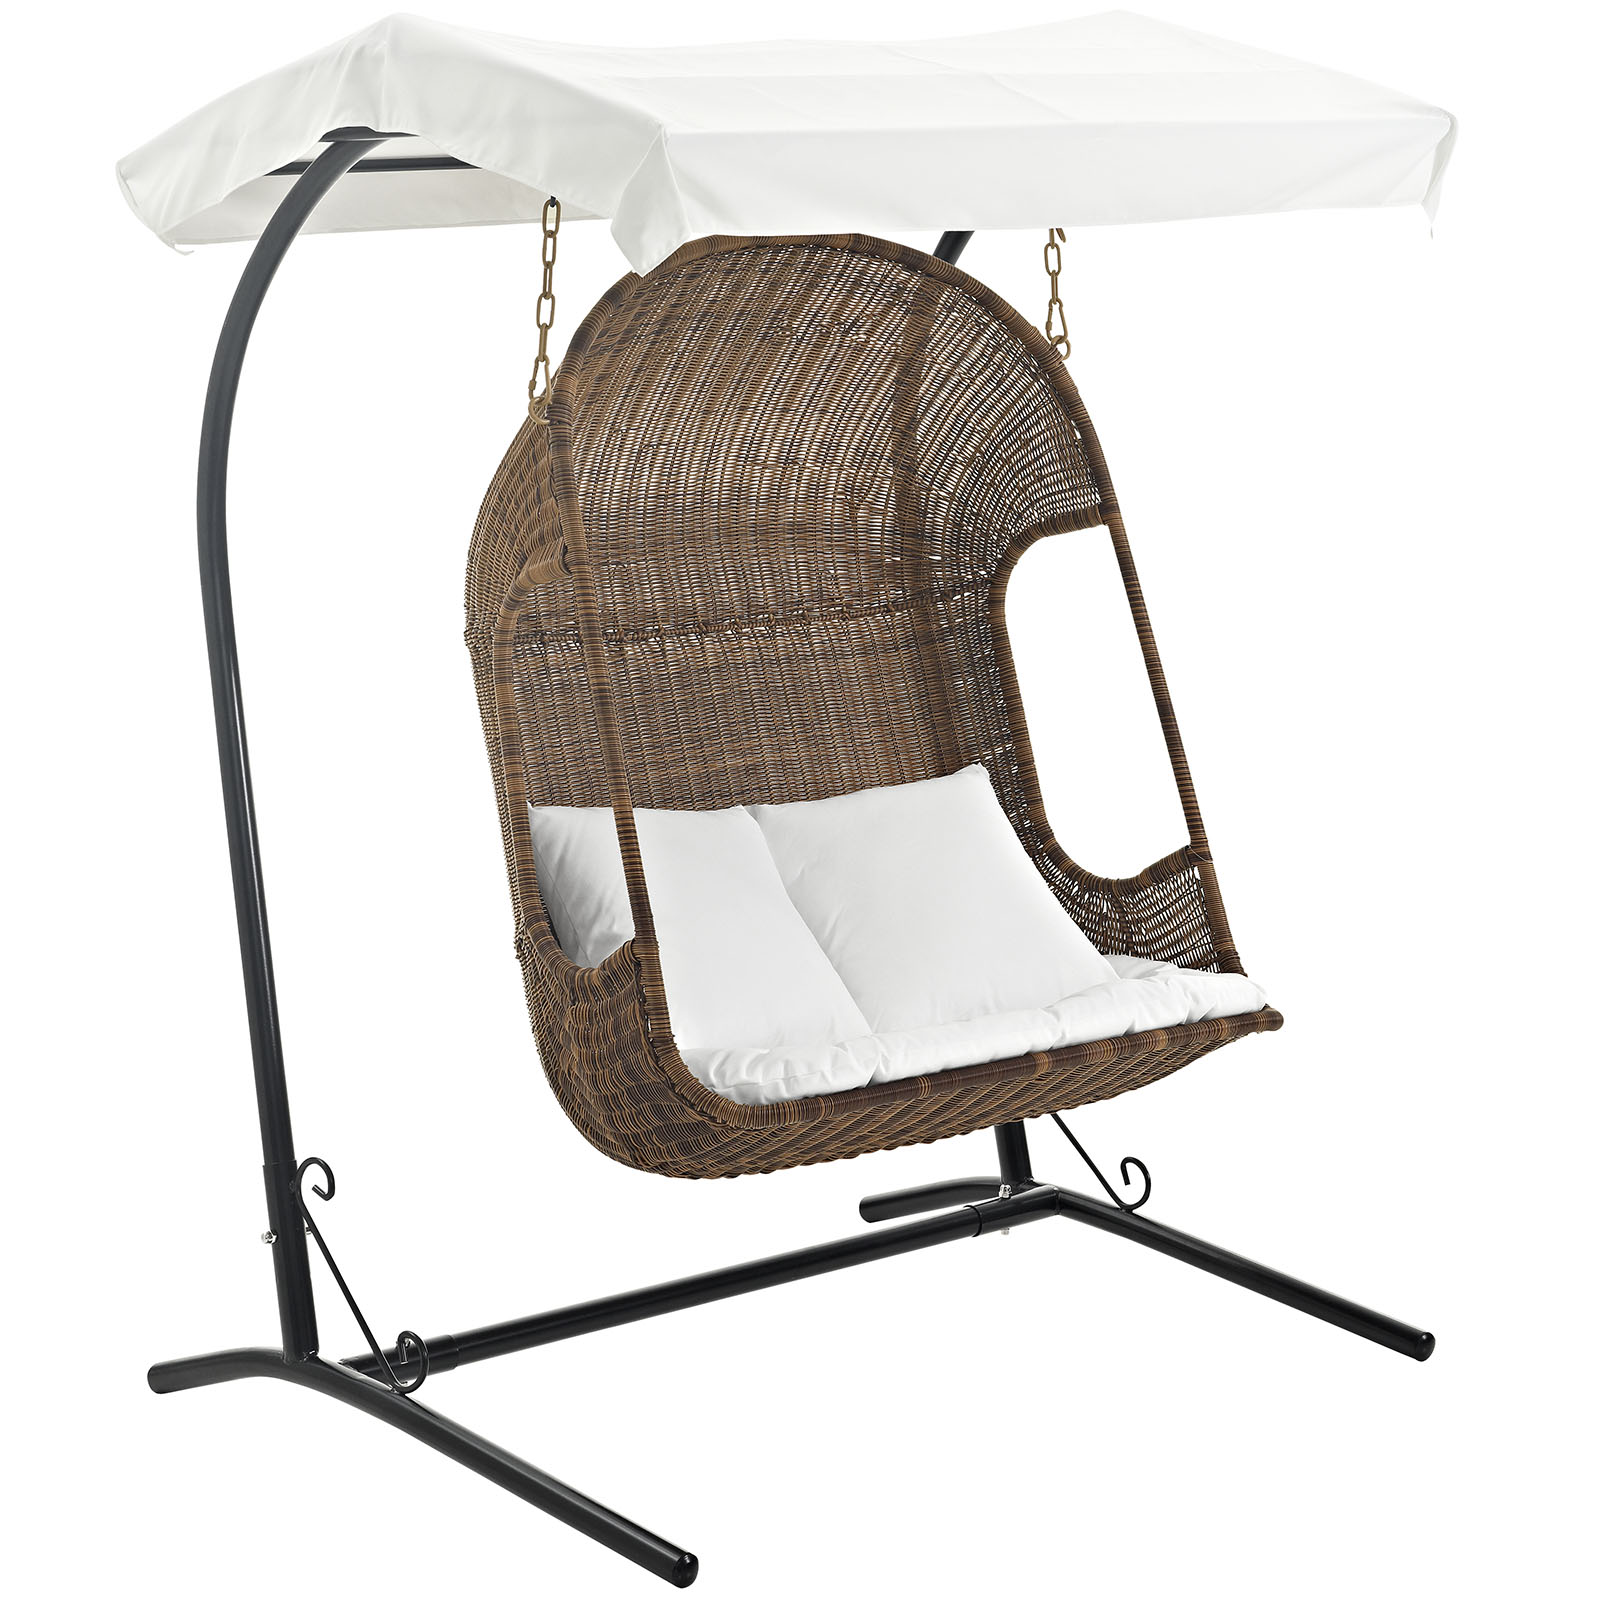 Modern Contemporary Urban Design Outdoor Patio Balcony Swing Chair, White, Rattan